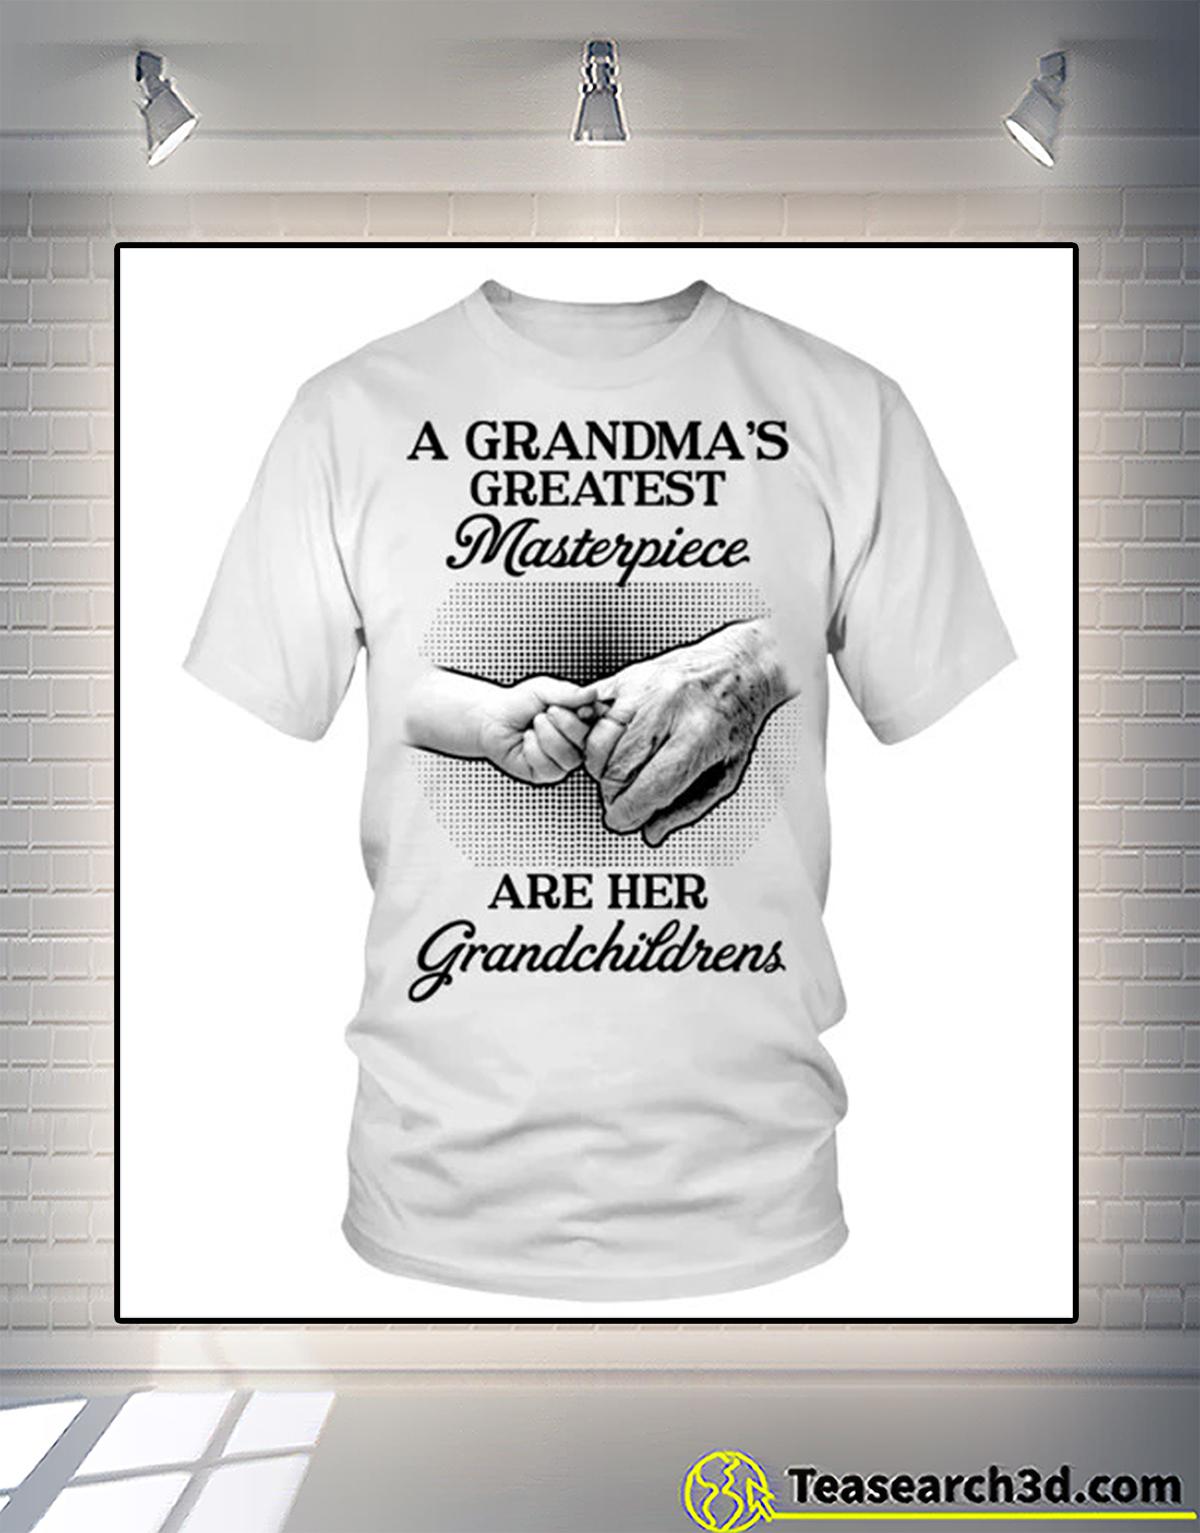 A grandma's greatest masterpiece are her grandchildrens shirt